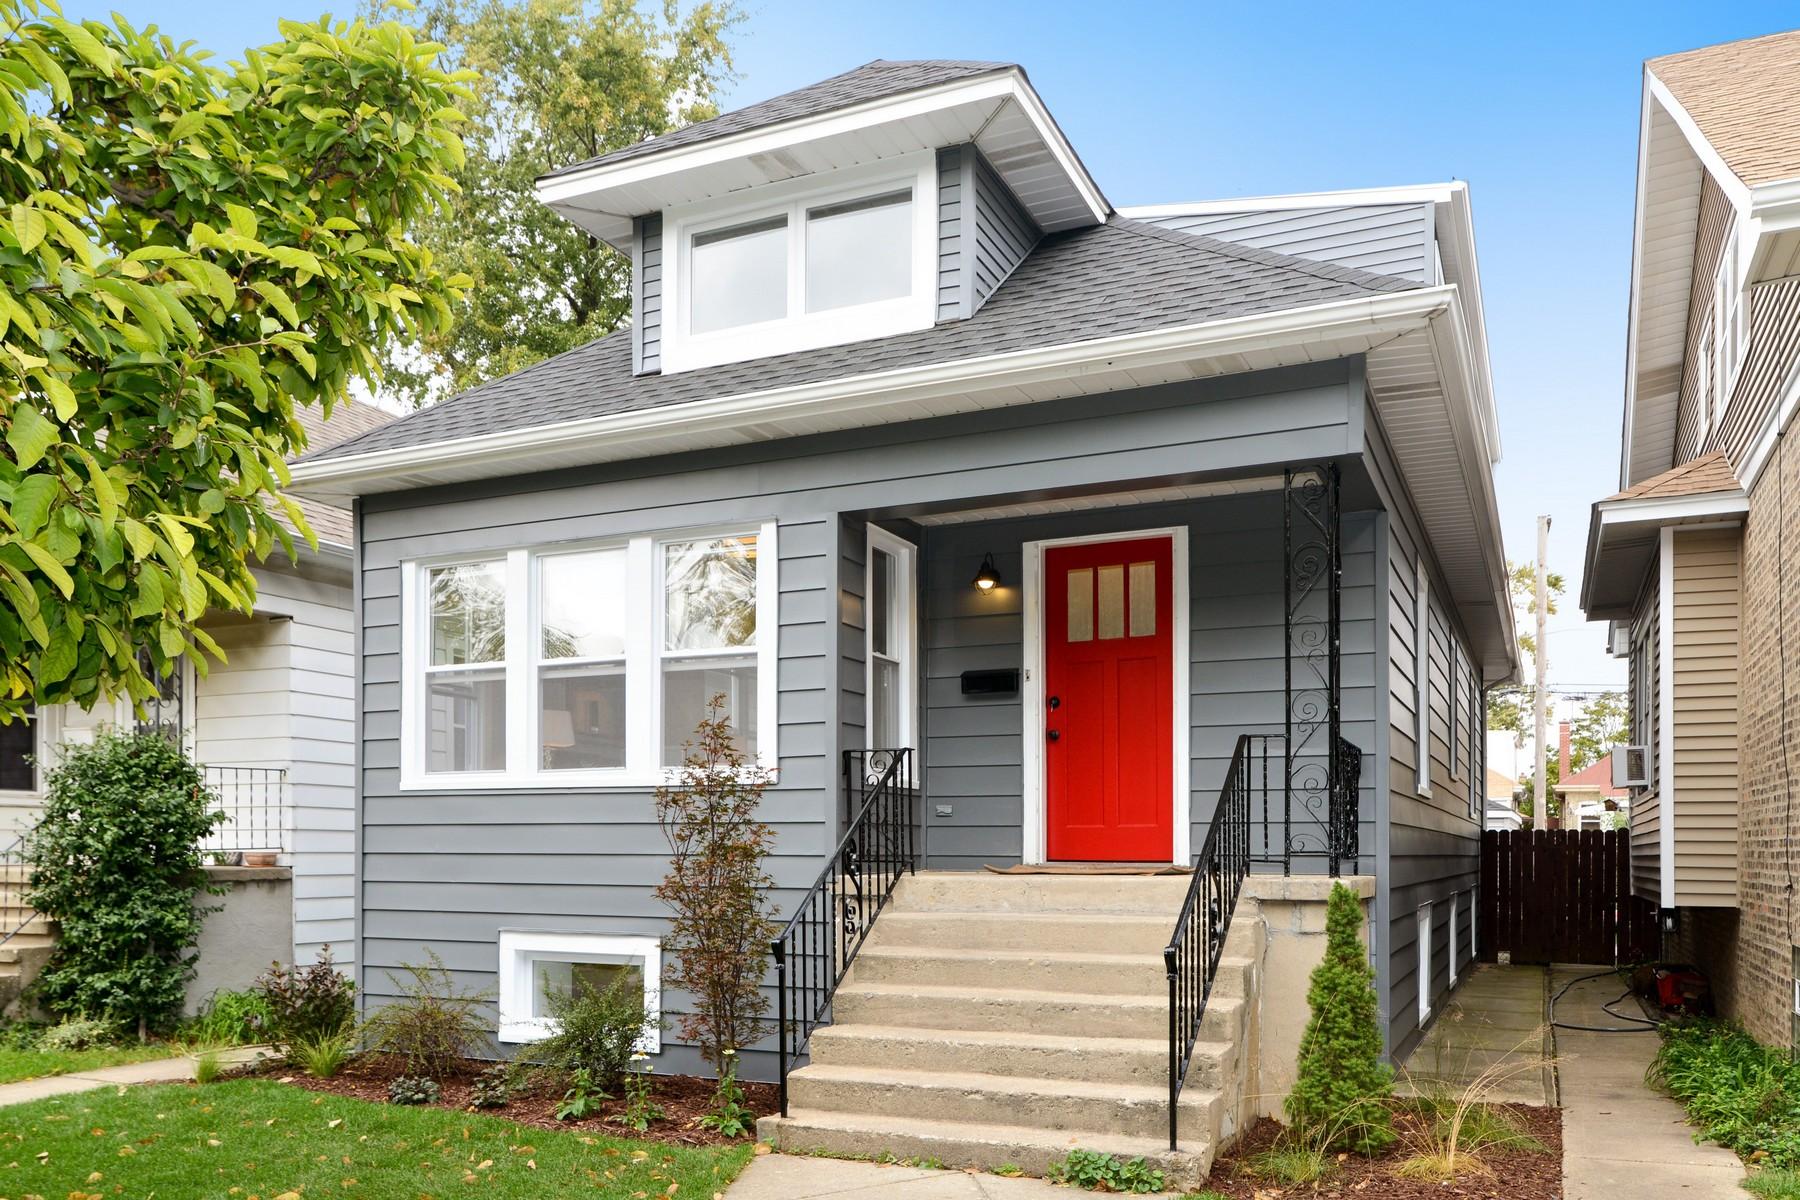 Moradia para Venda às Meticulously Rehabbed Jefferson Park Home 5336 N Lieb Avenue Jefferson Park, Chicago, Illinois, 60630 Estados Unidos